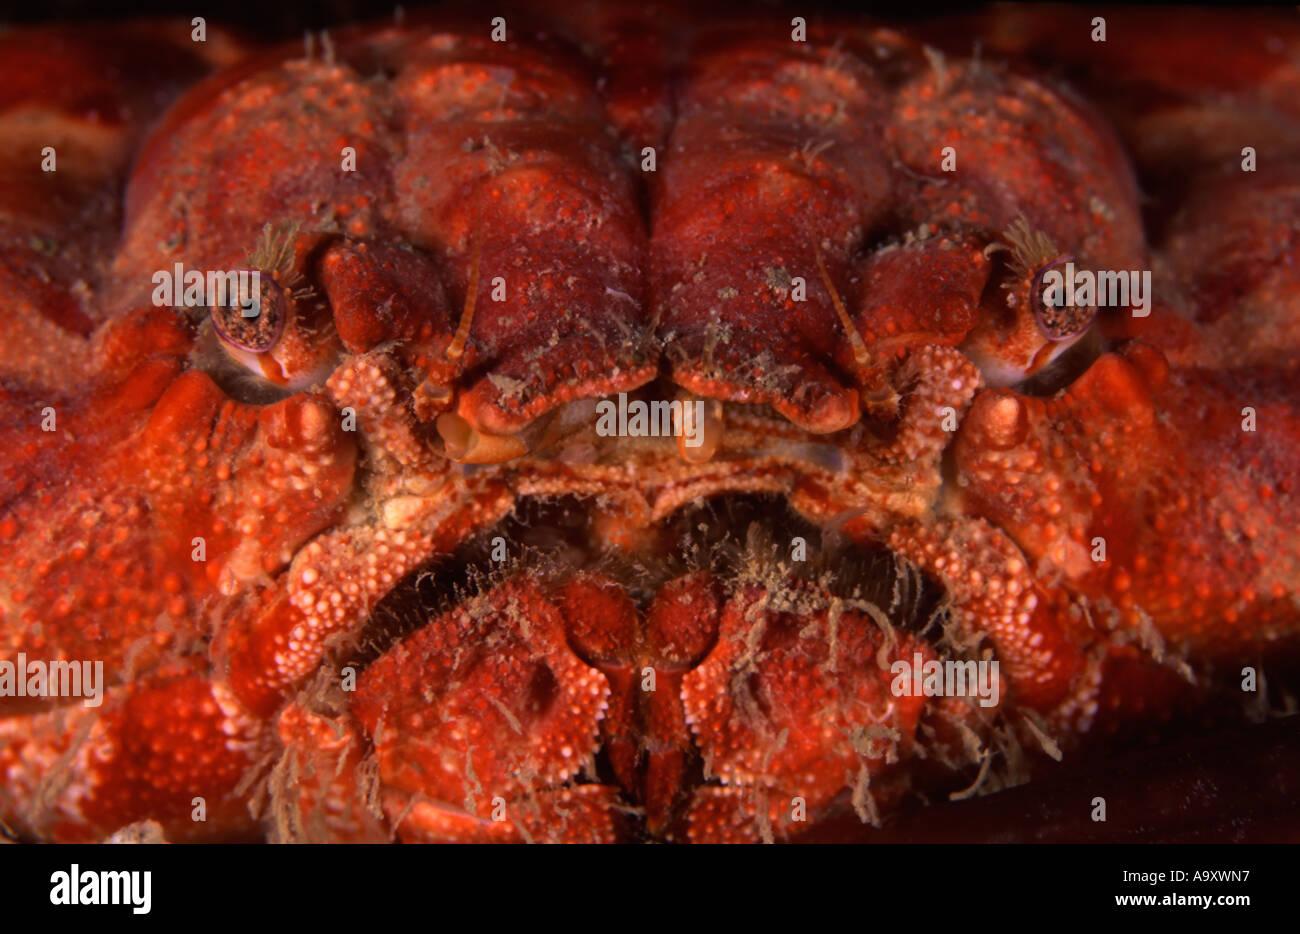 Round Crab - Stock Image